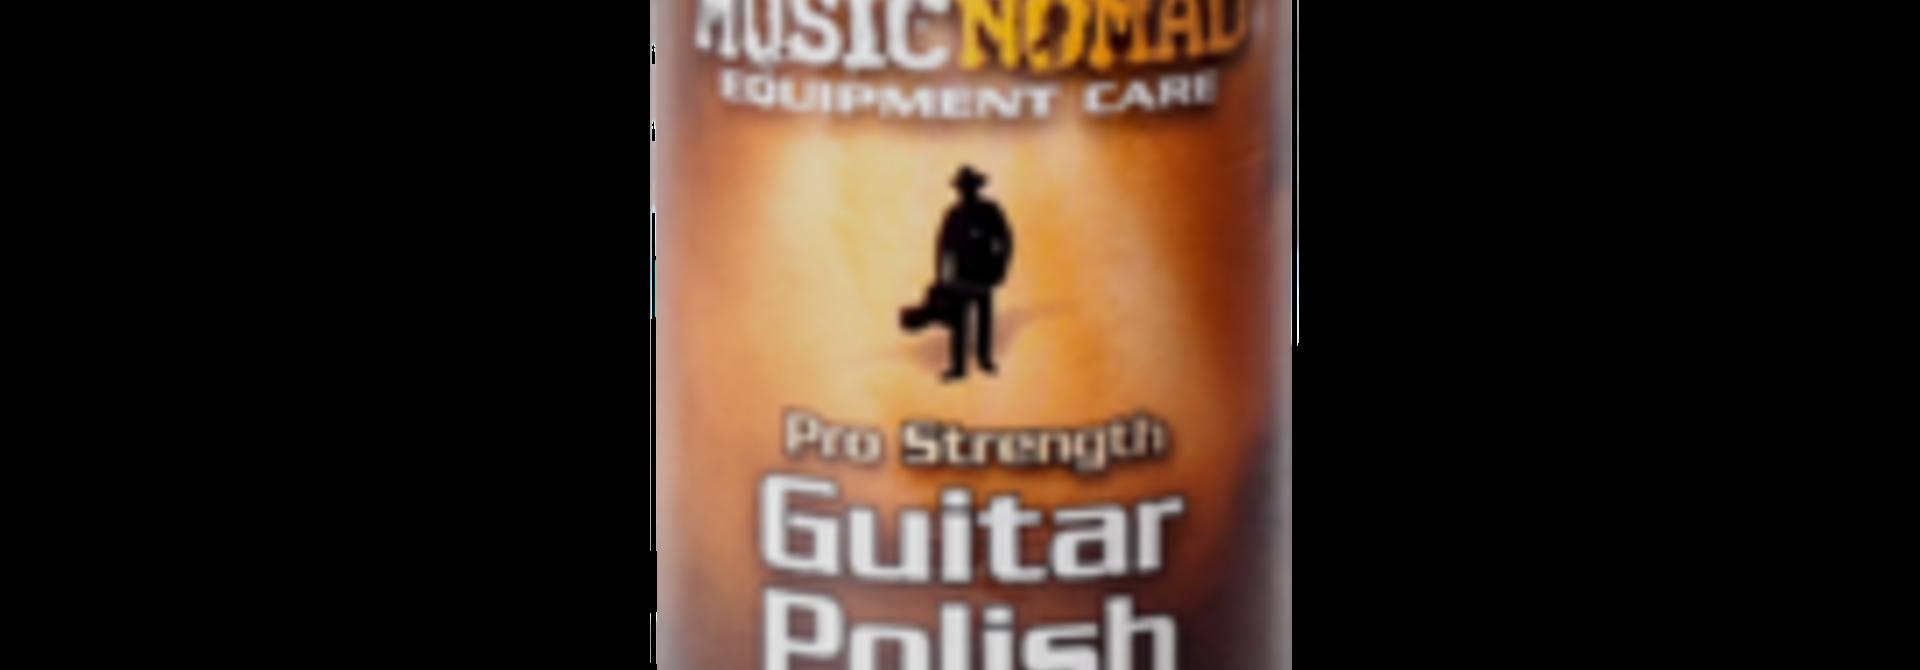 Music Nomad Guitar Polish - Pro Strength 4 oz. MN101